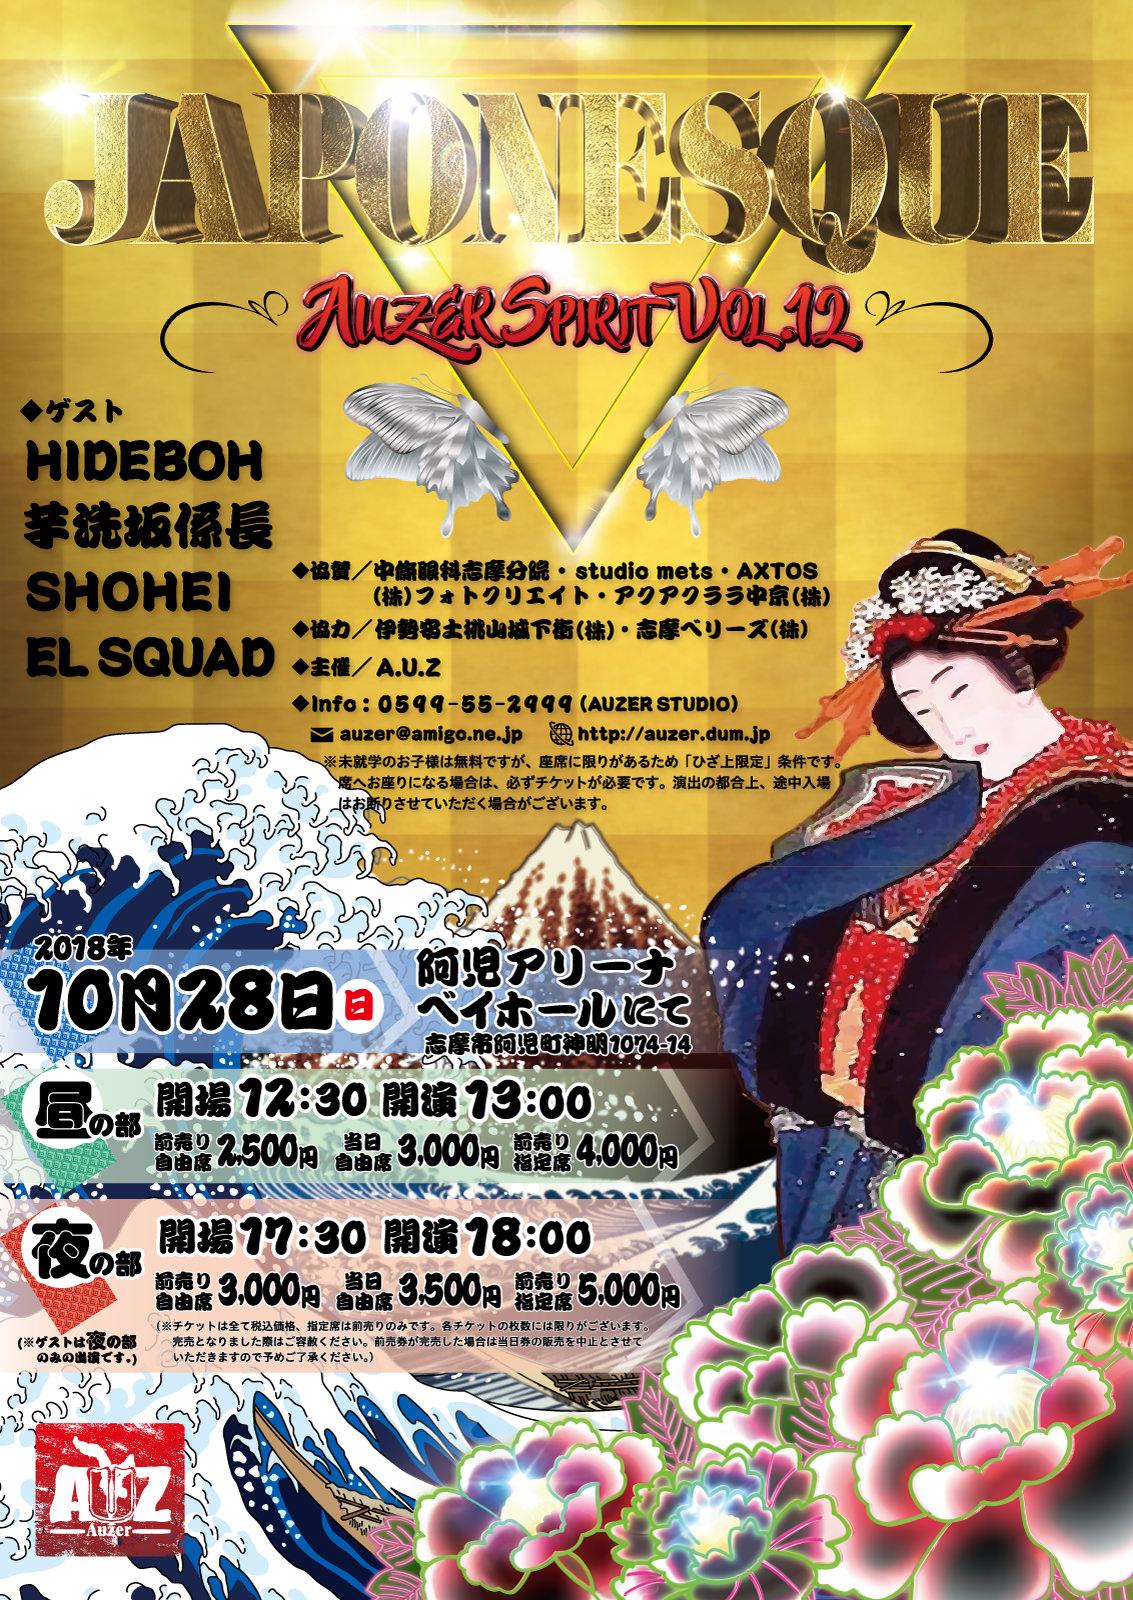 AuzerSpiritVol.12 JAPONESQUE